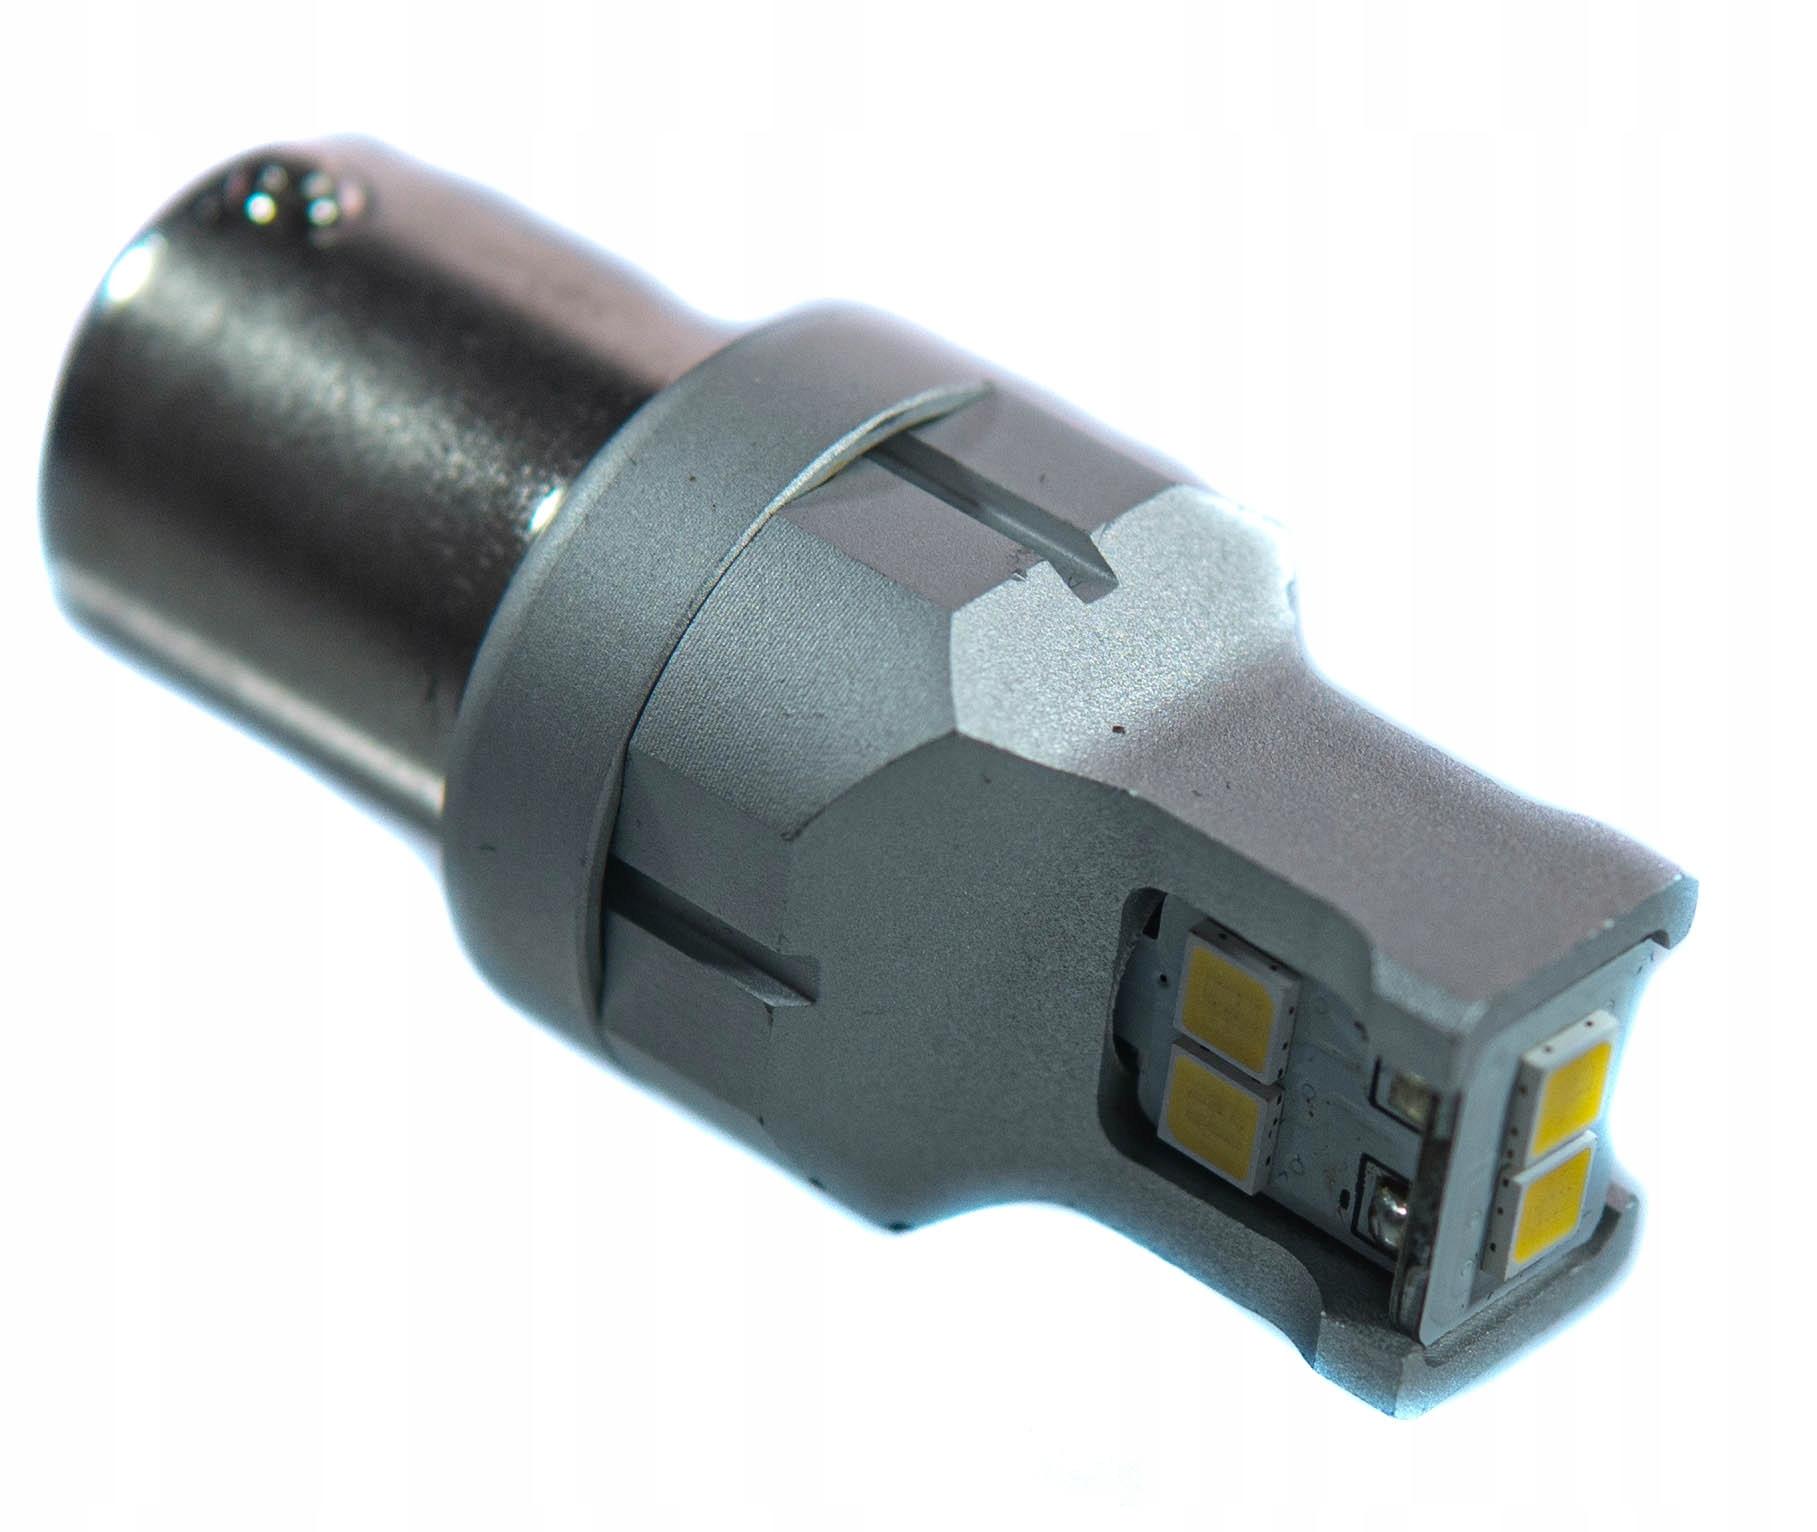 P21W 1156 LED - 6 SMD 3030 - BA15S - WSTECZNE LEDY Producent inny